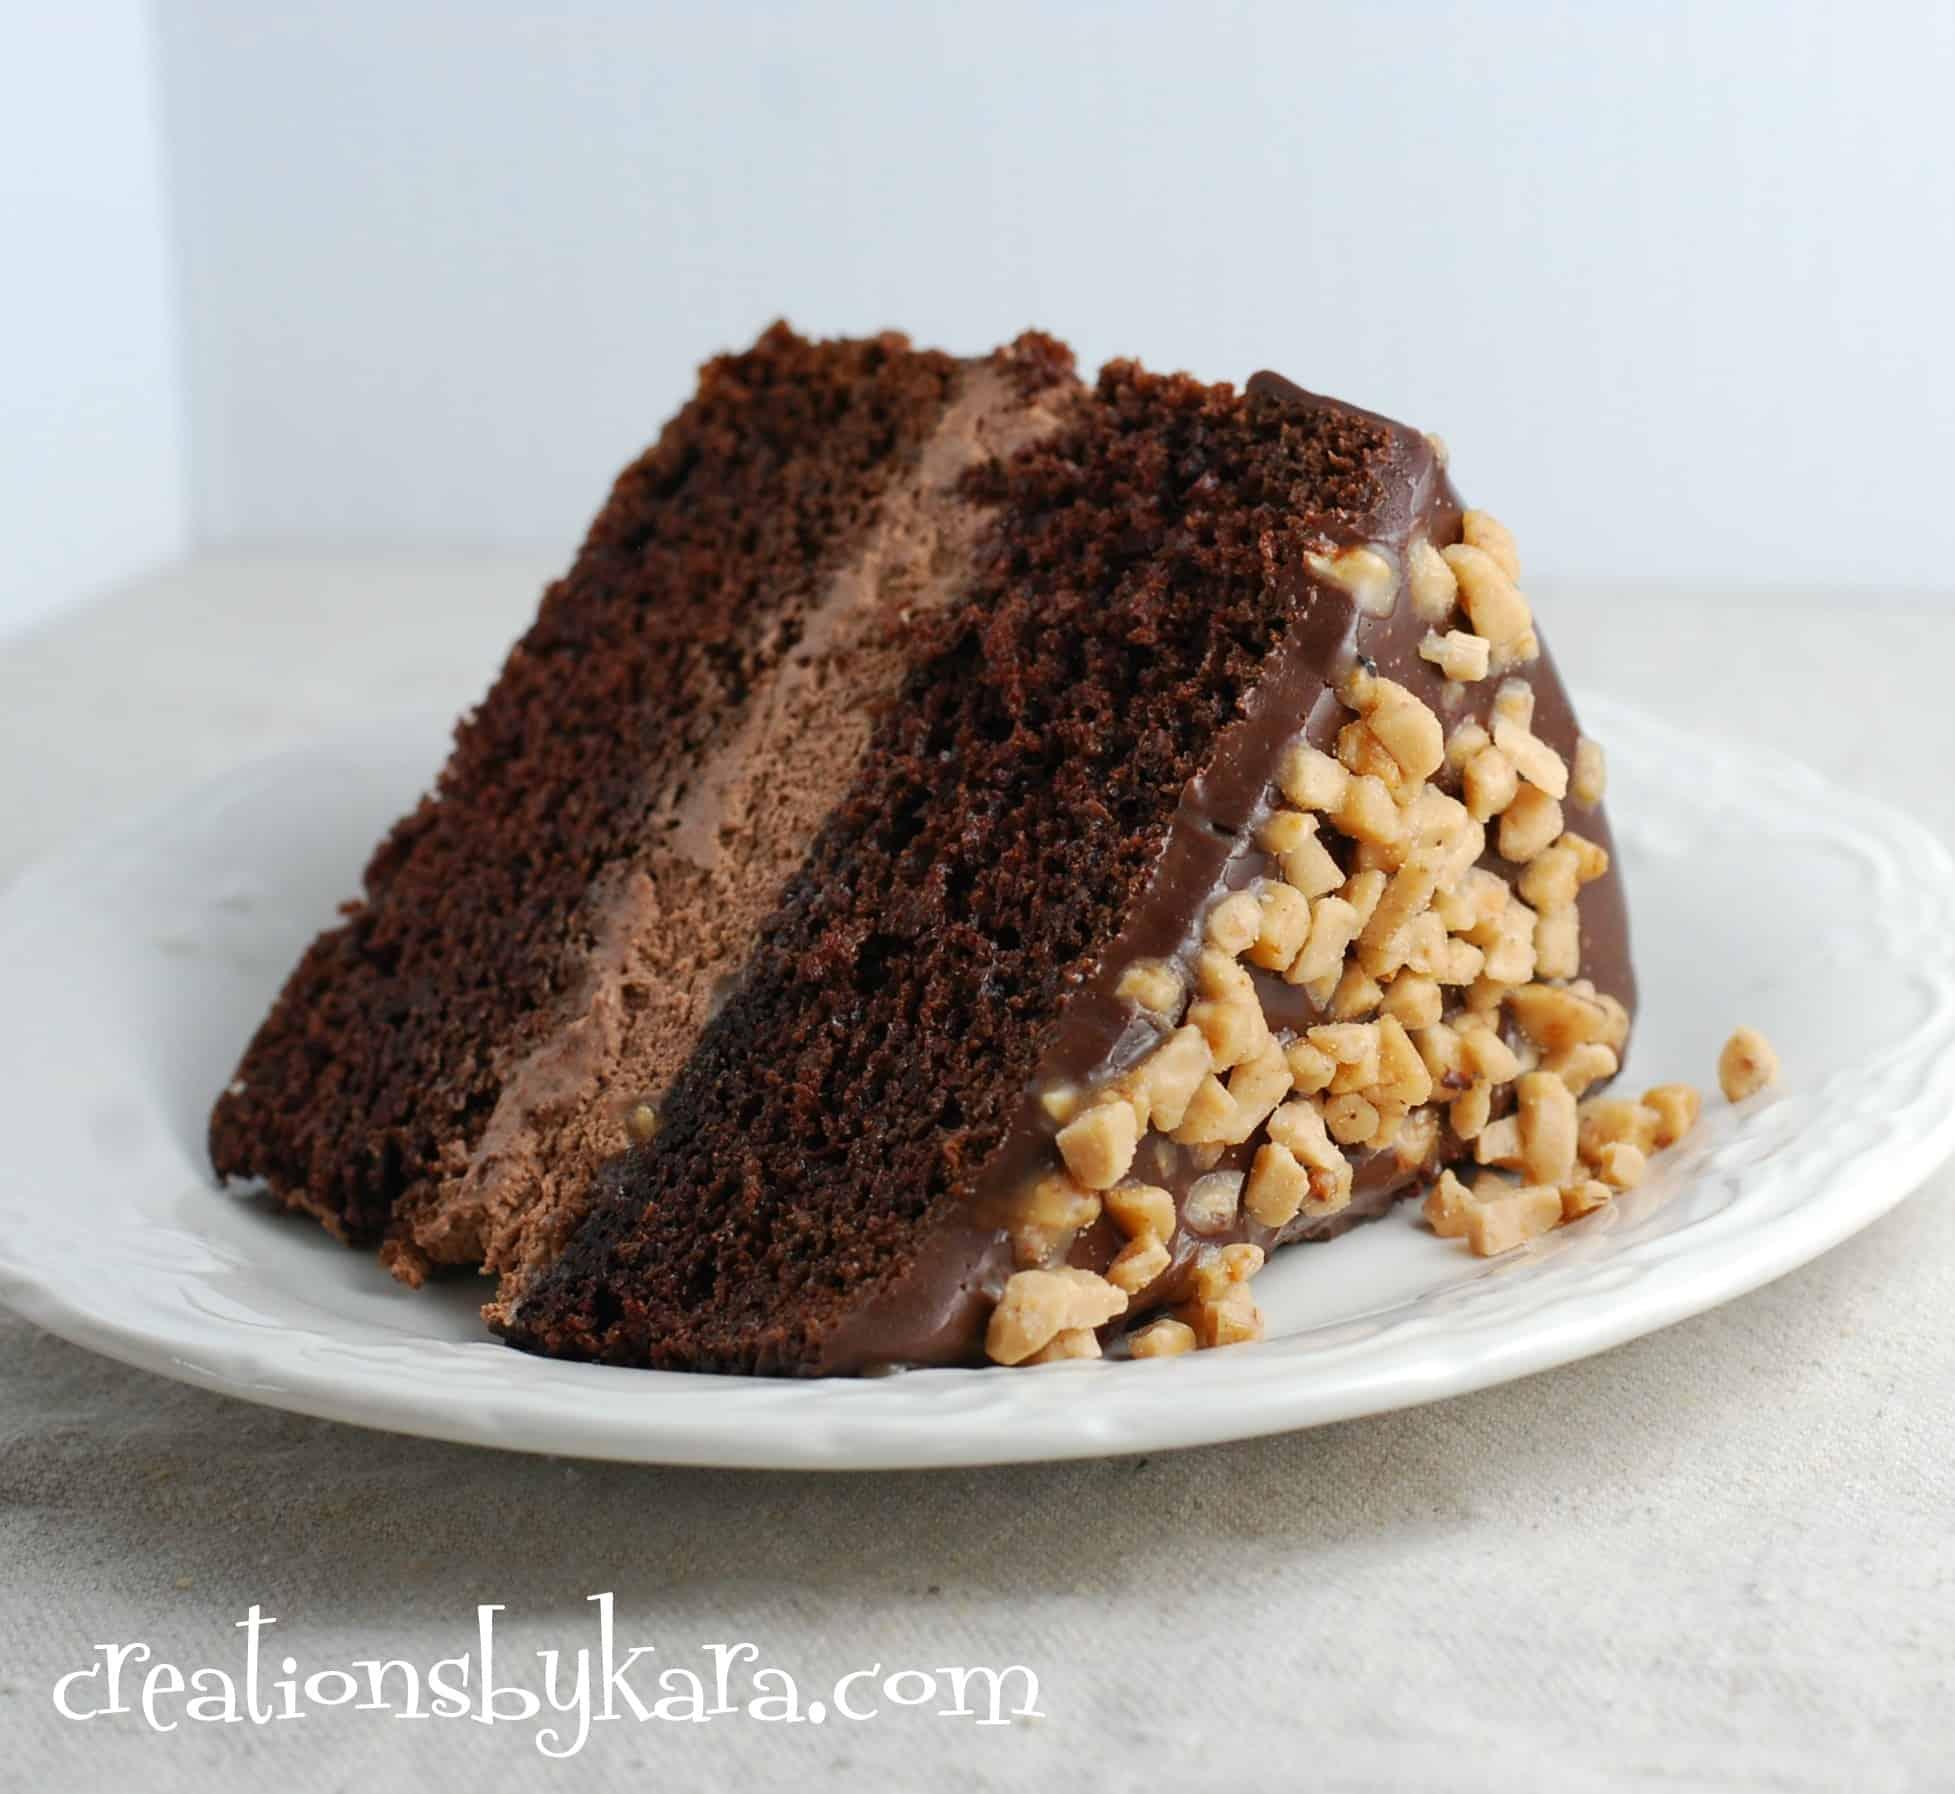 chocolate-mousse-recipe-chocolate-cake-recipe